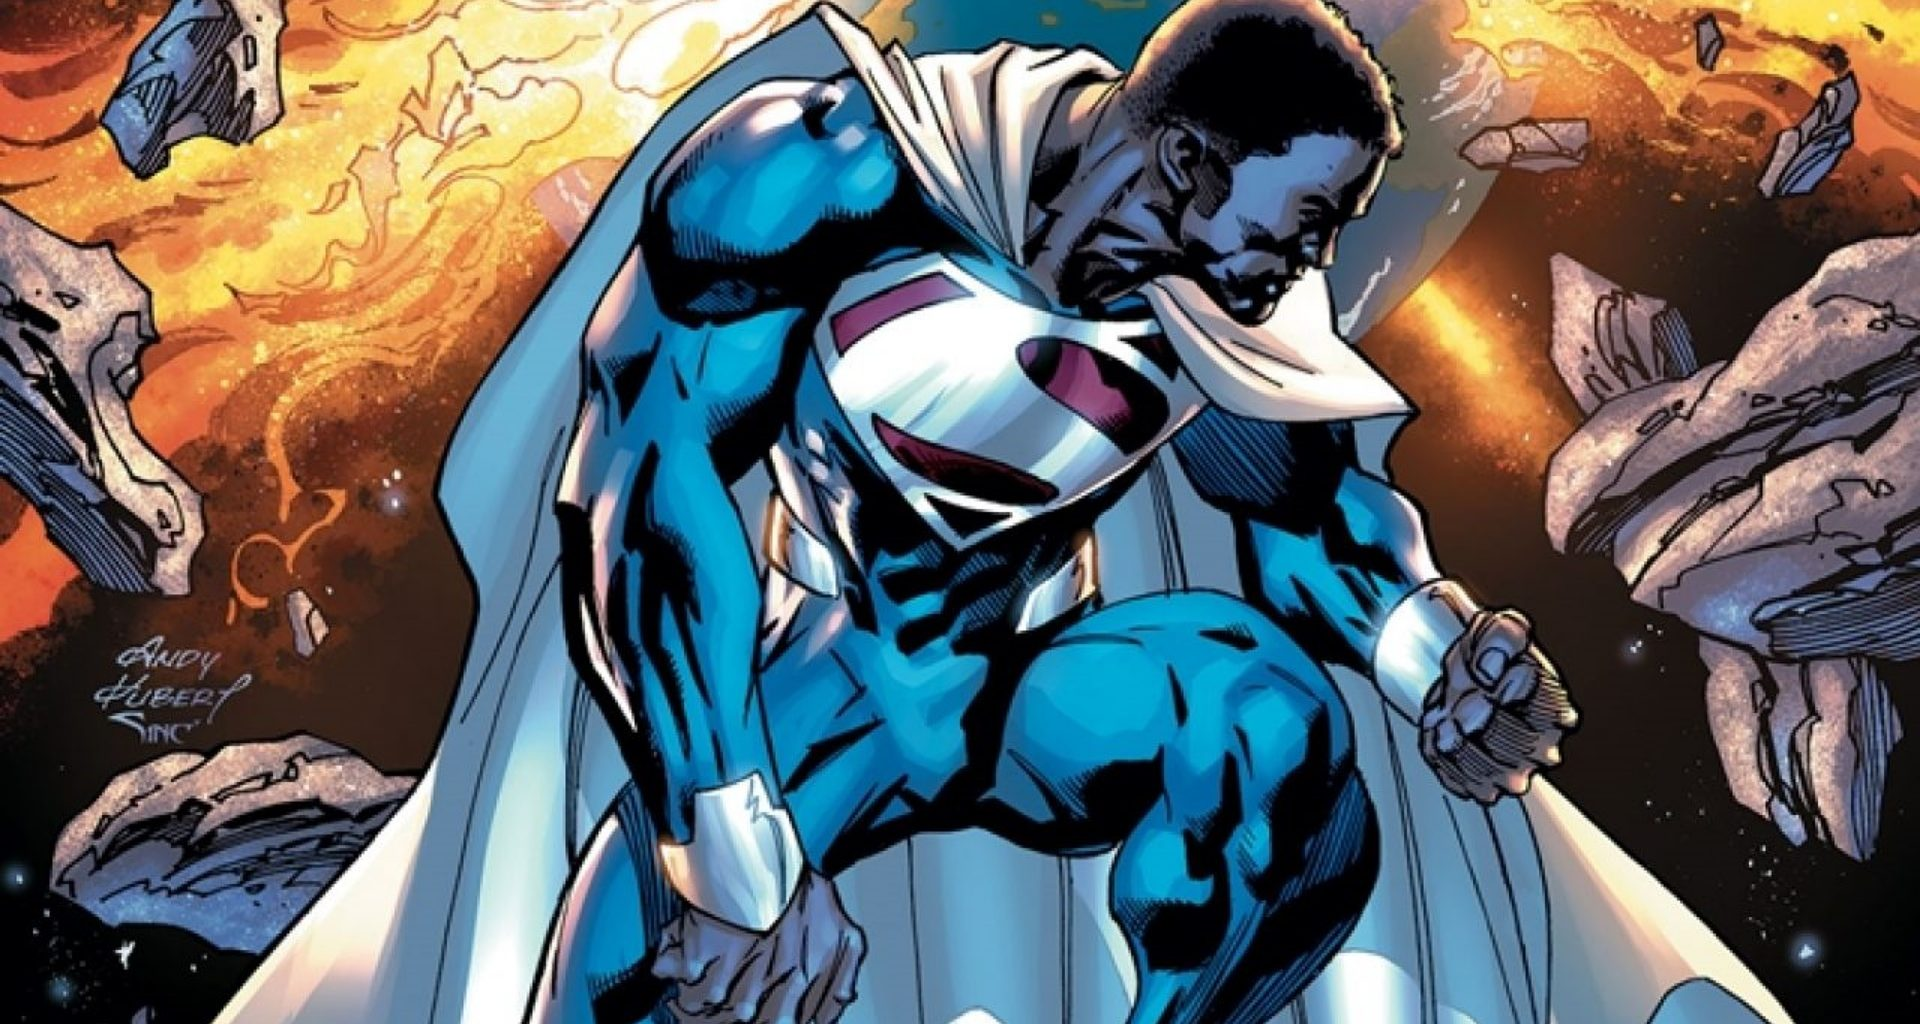 superman val zod destaque dc wikia 1280x720 1